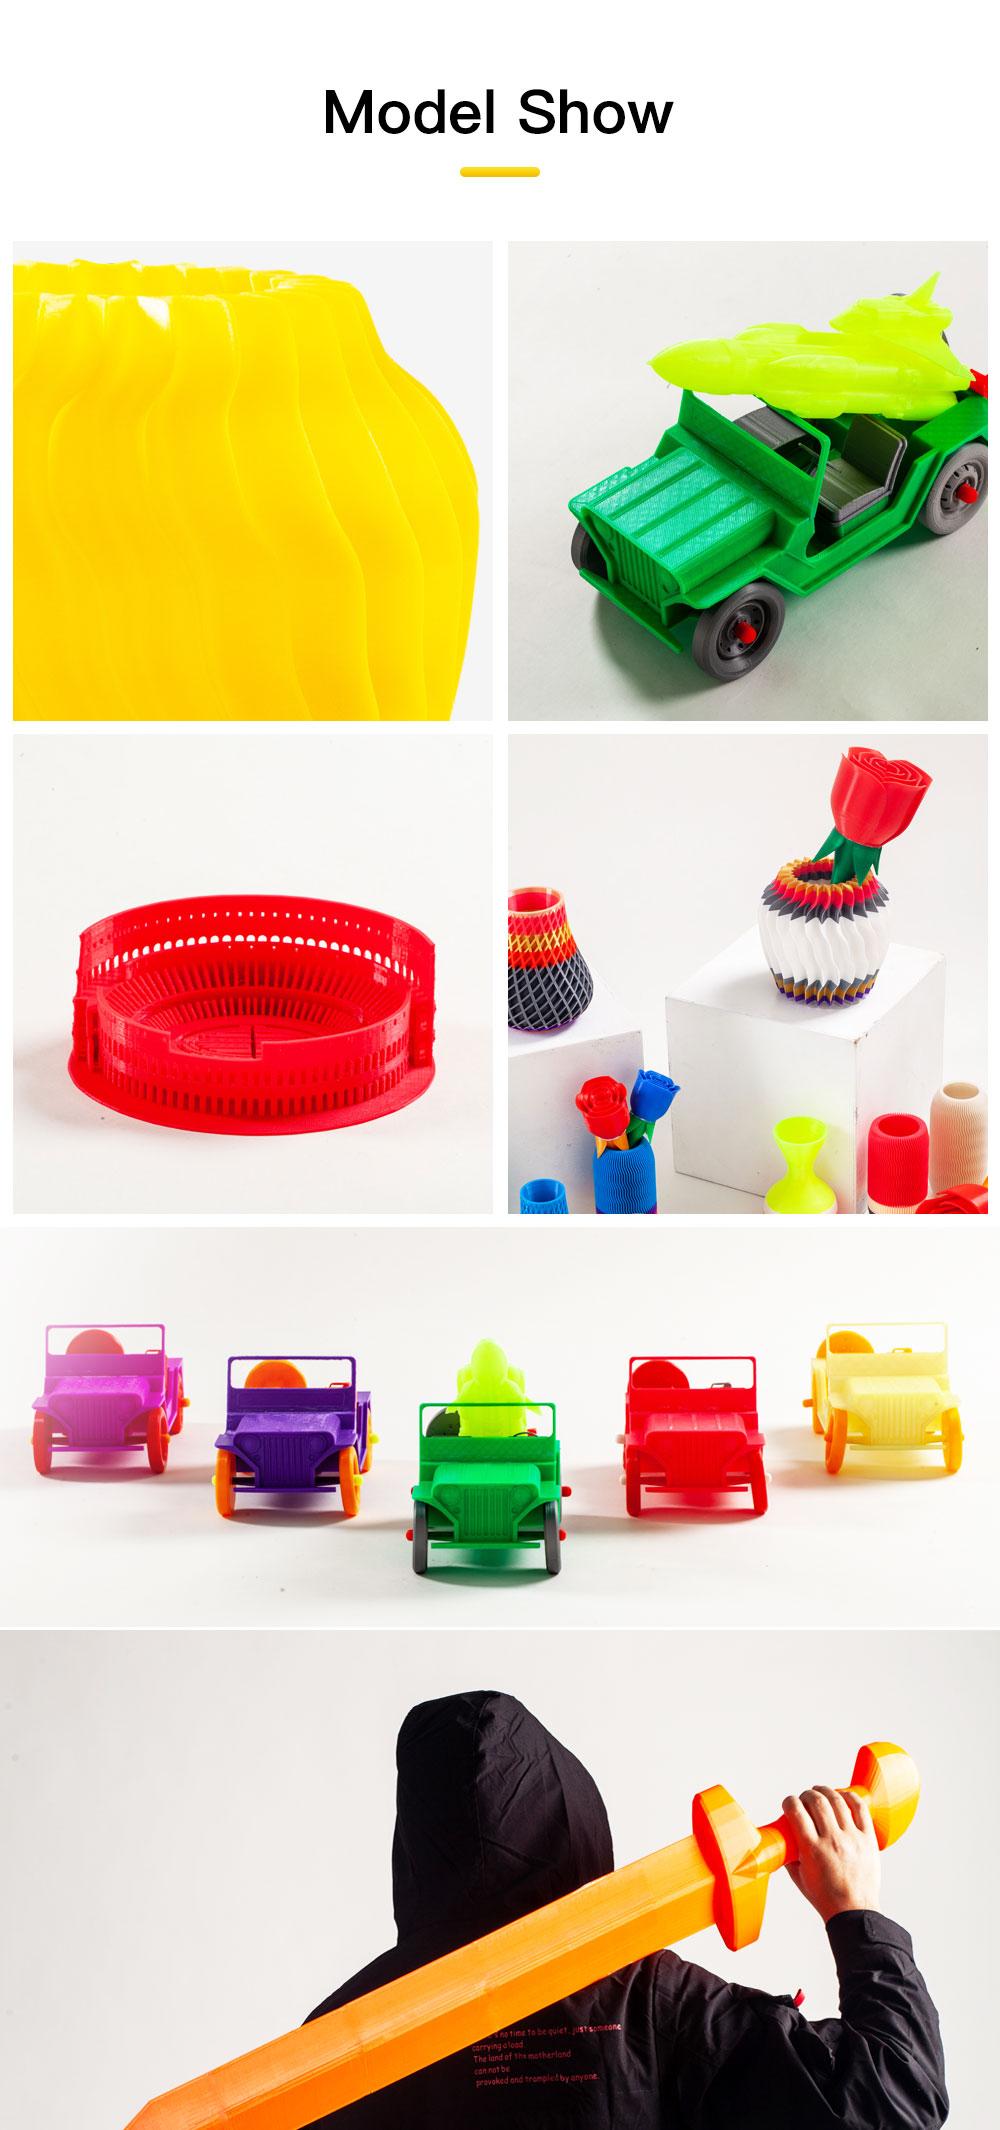 images/new-electronics/A1591796PB/flsun-reg;-q5-3d-printer-kit-200-200mm-print-size-supprt-resume-print-with-tft-32bit-mainboard-tmc2208-slient-driver-colorful-touch-screen-plusbuyer_5.jpg